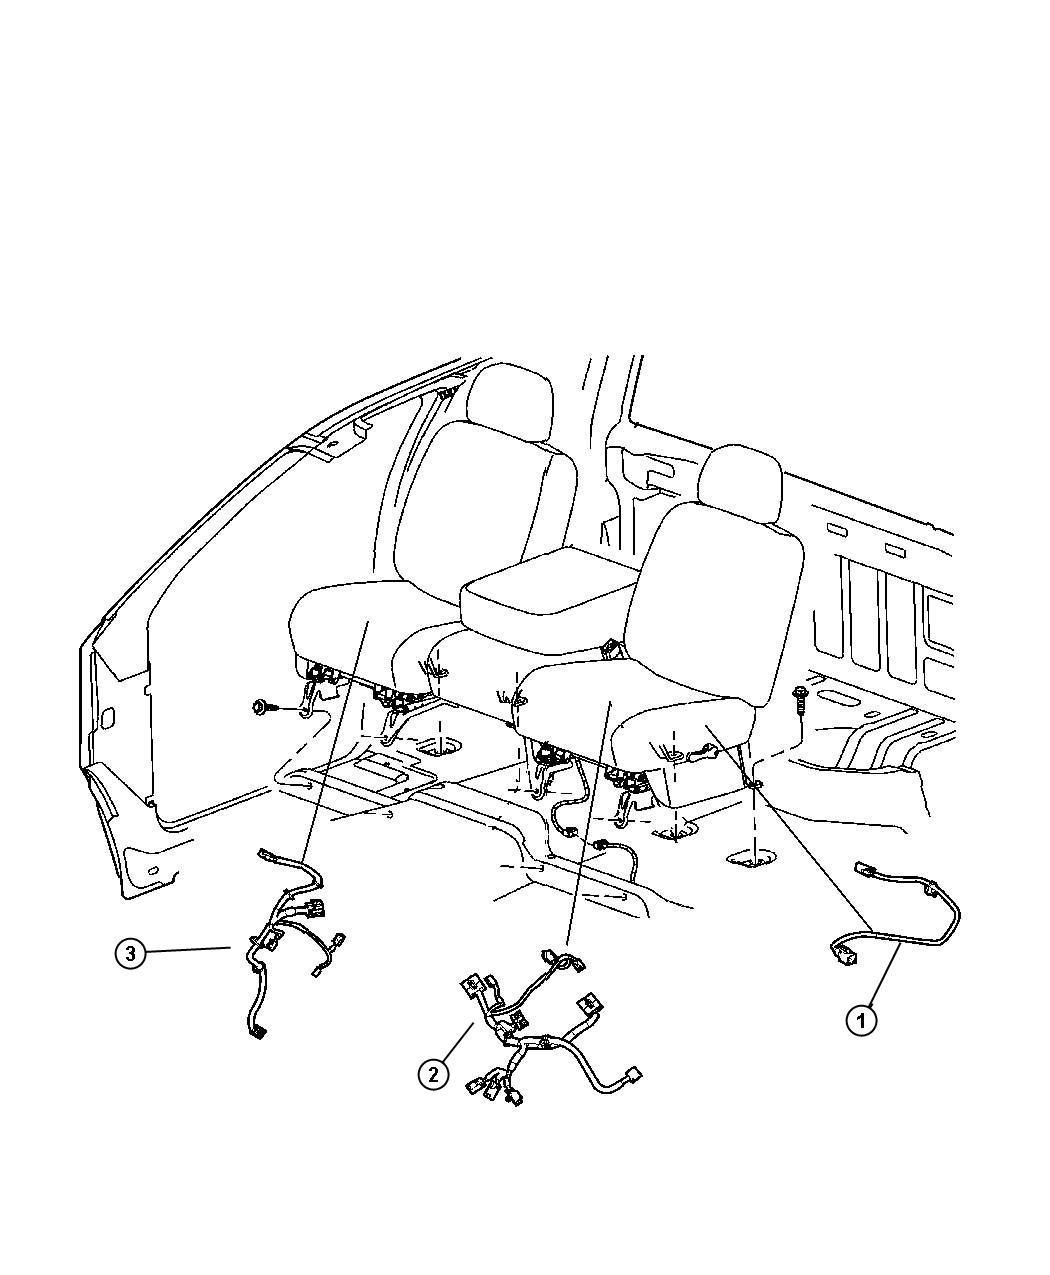 Dodge Dakota Wiring Power Seat Seat Heated Front